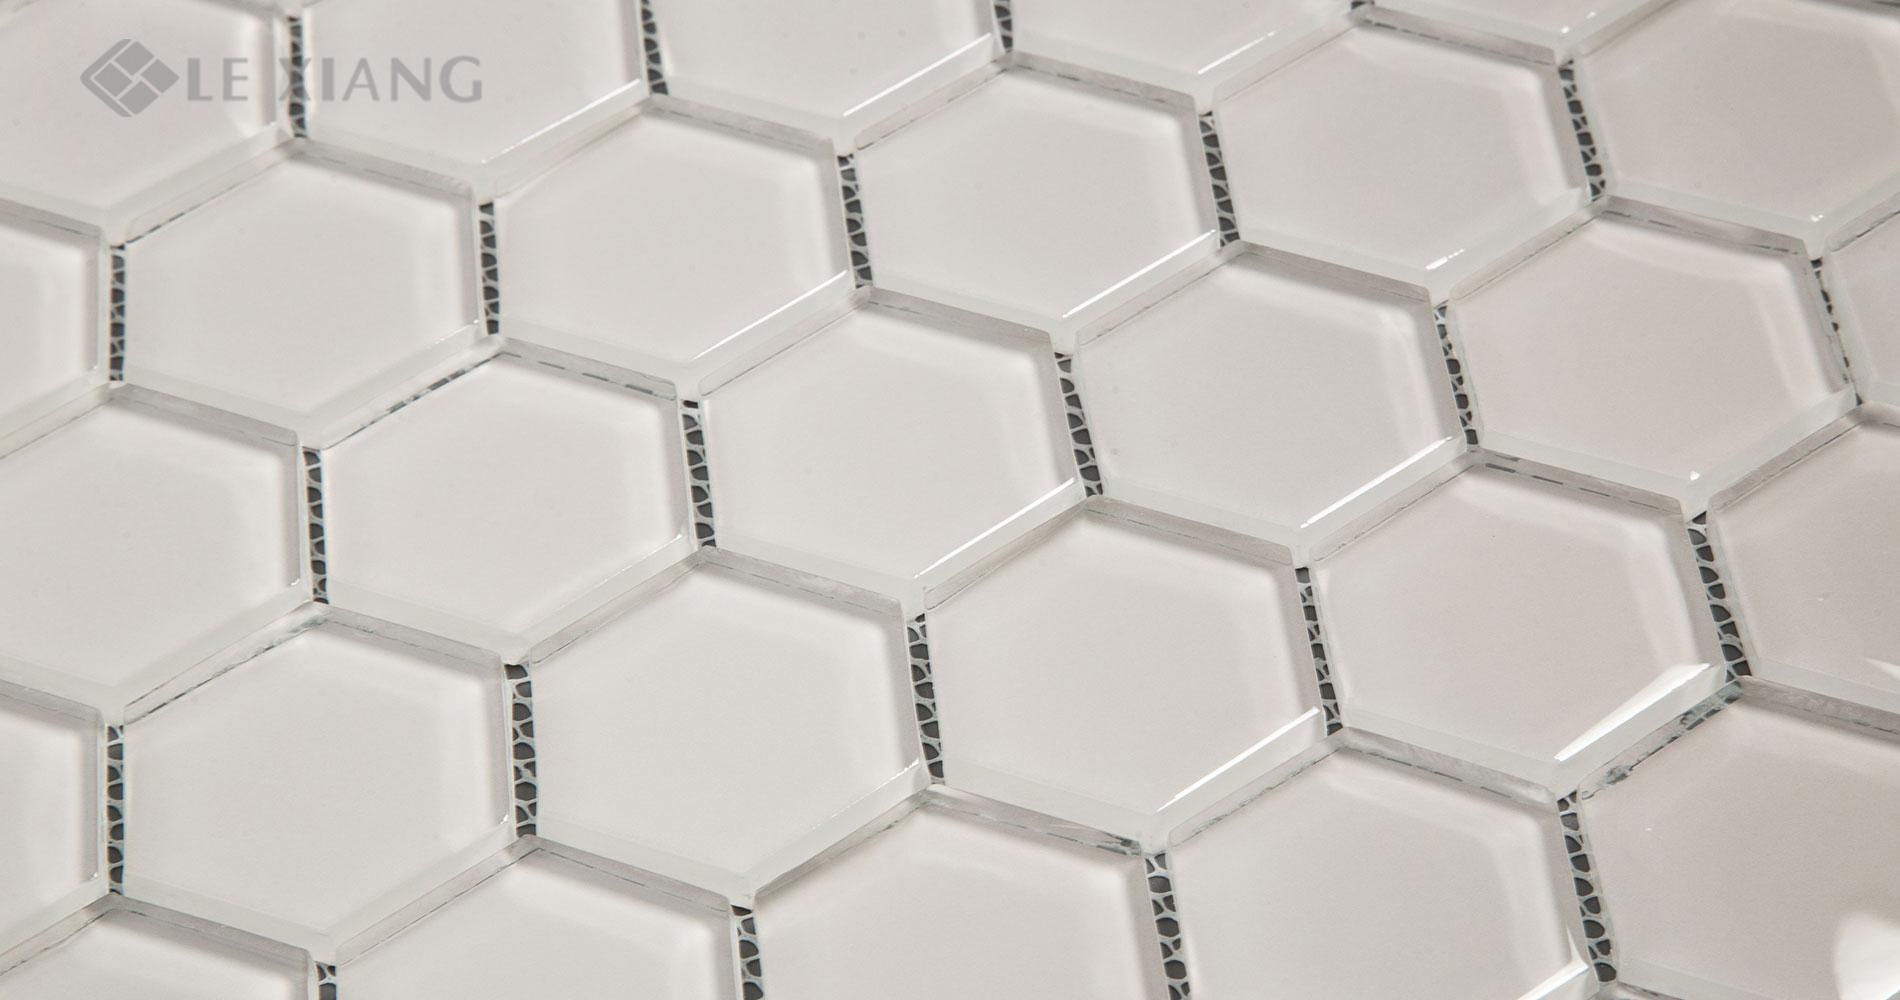 Hexagon Crystal Glass Mosaic Tiles For Bathroom Wall LX-M-080